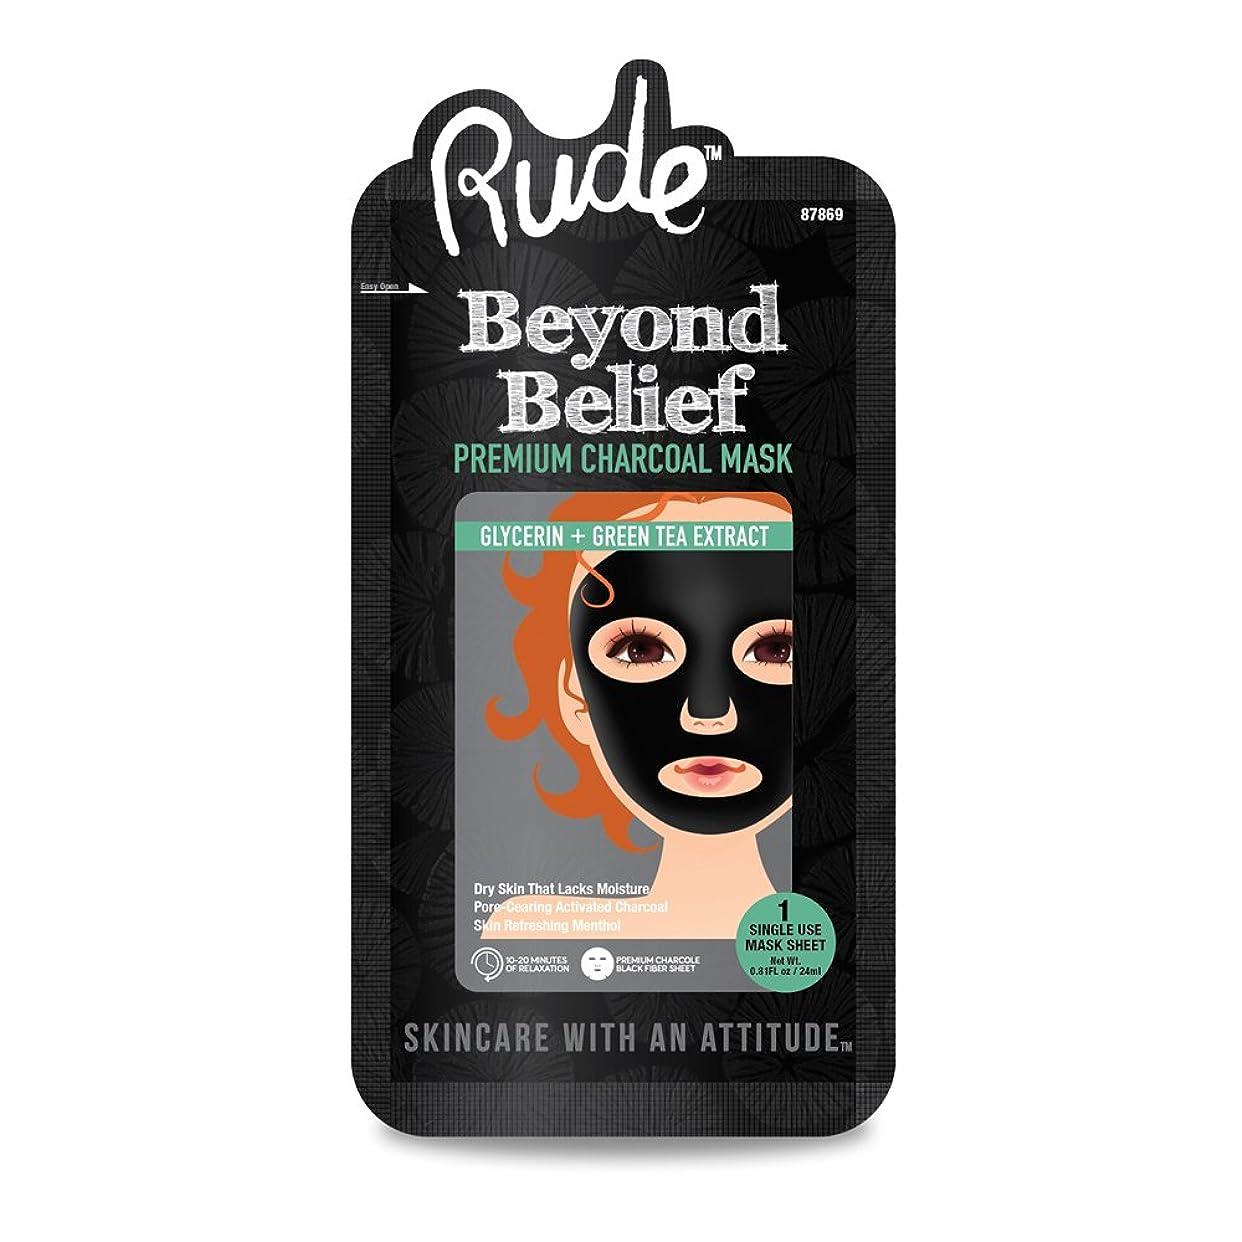 断線多用途学習者RUDE Beyond Belief Purifying Charcoal Face Mask (並行輸入品)